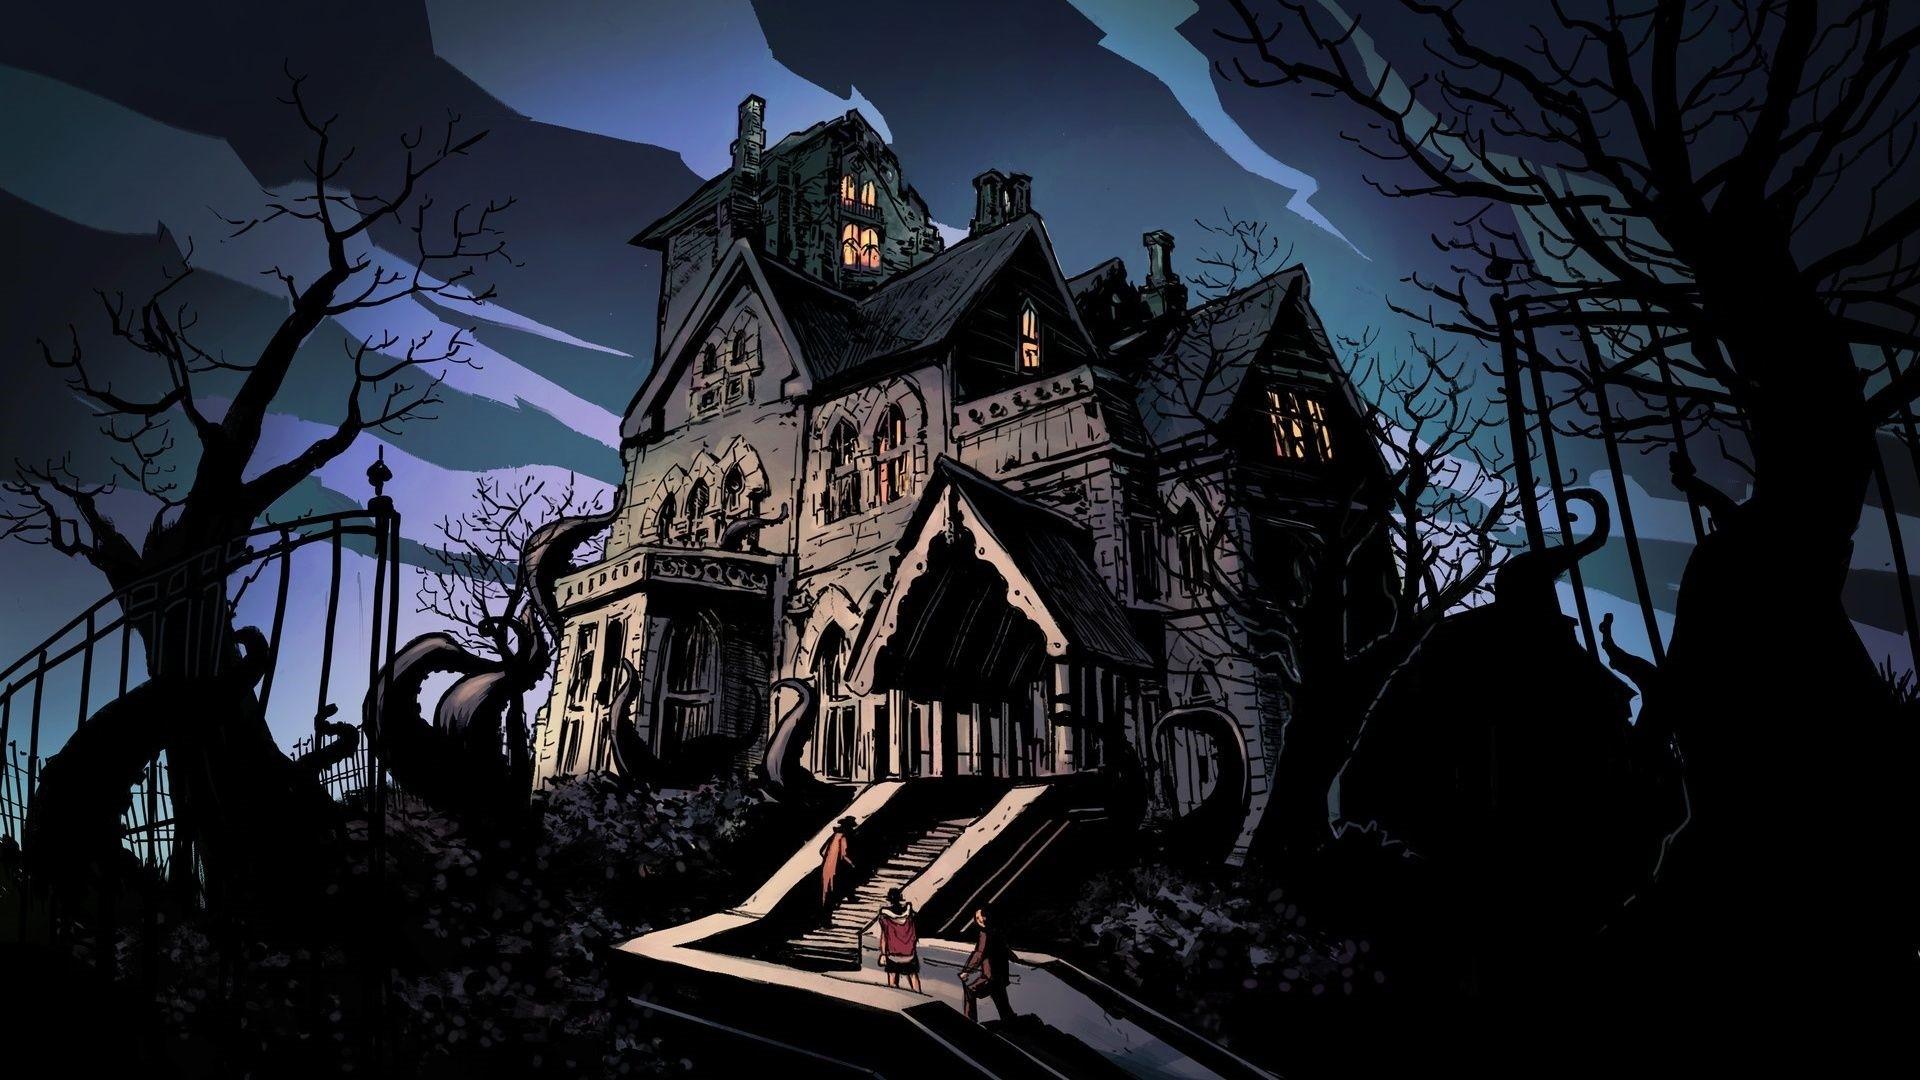 Spooky Download Wallpaper